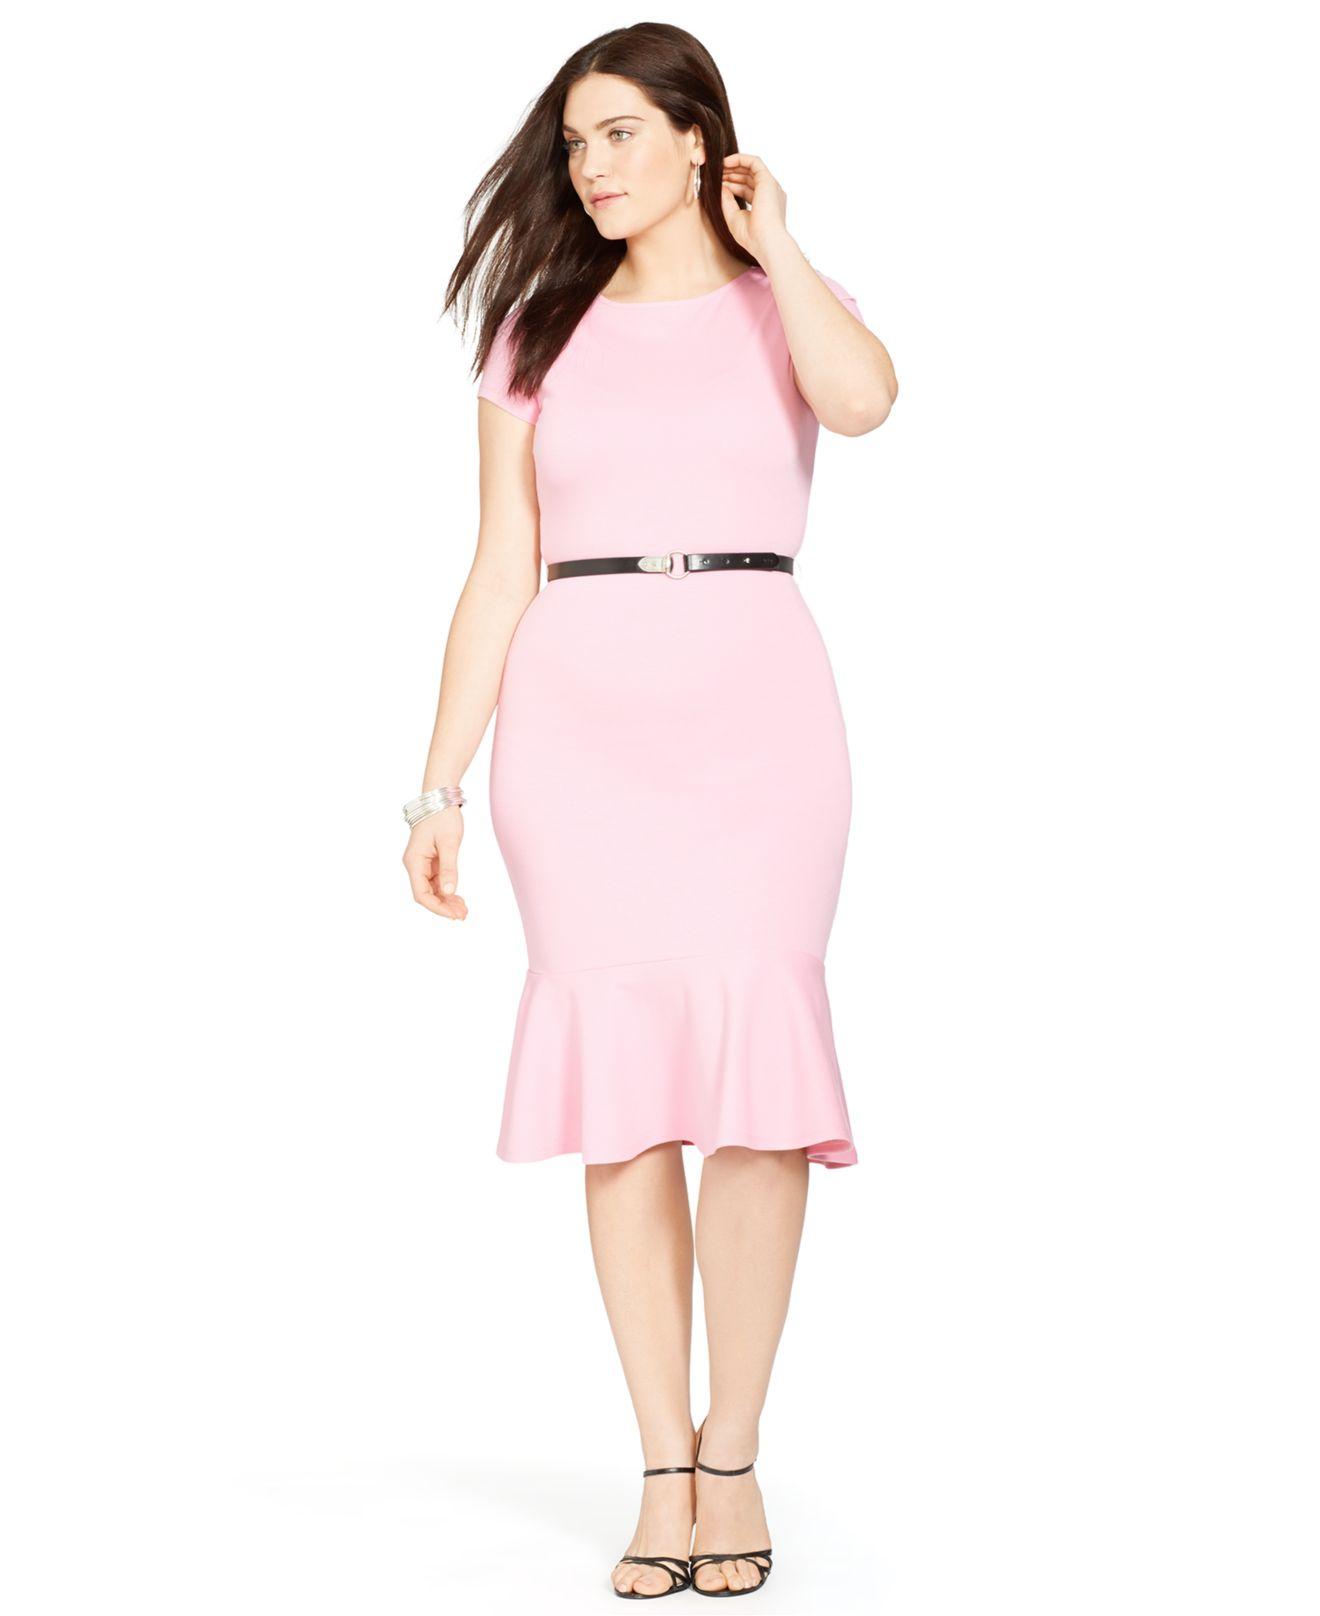 Lyst Lauren By Ralph Lauren Plus Size Belted Peplum Dress In Pink